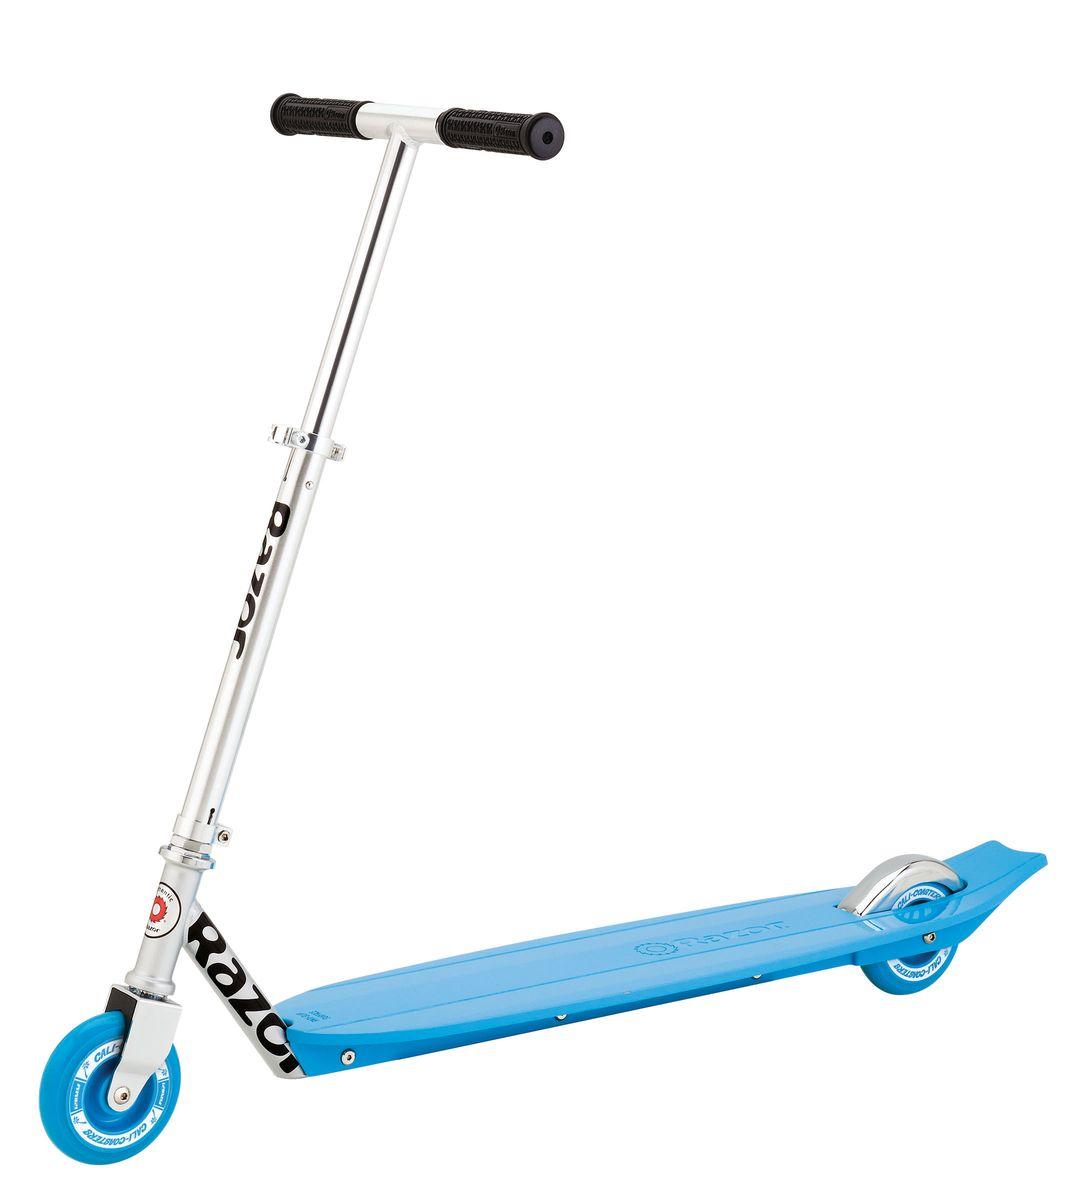 Самокат Razor California Longboard, цвет: голубой083003